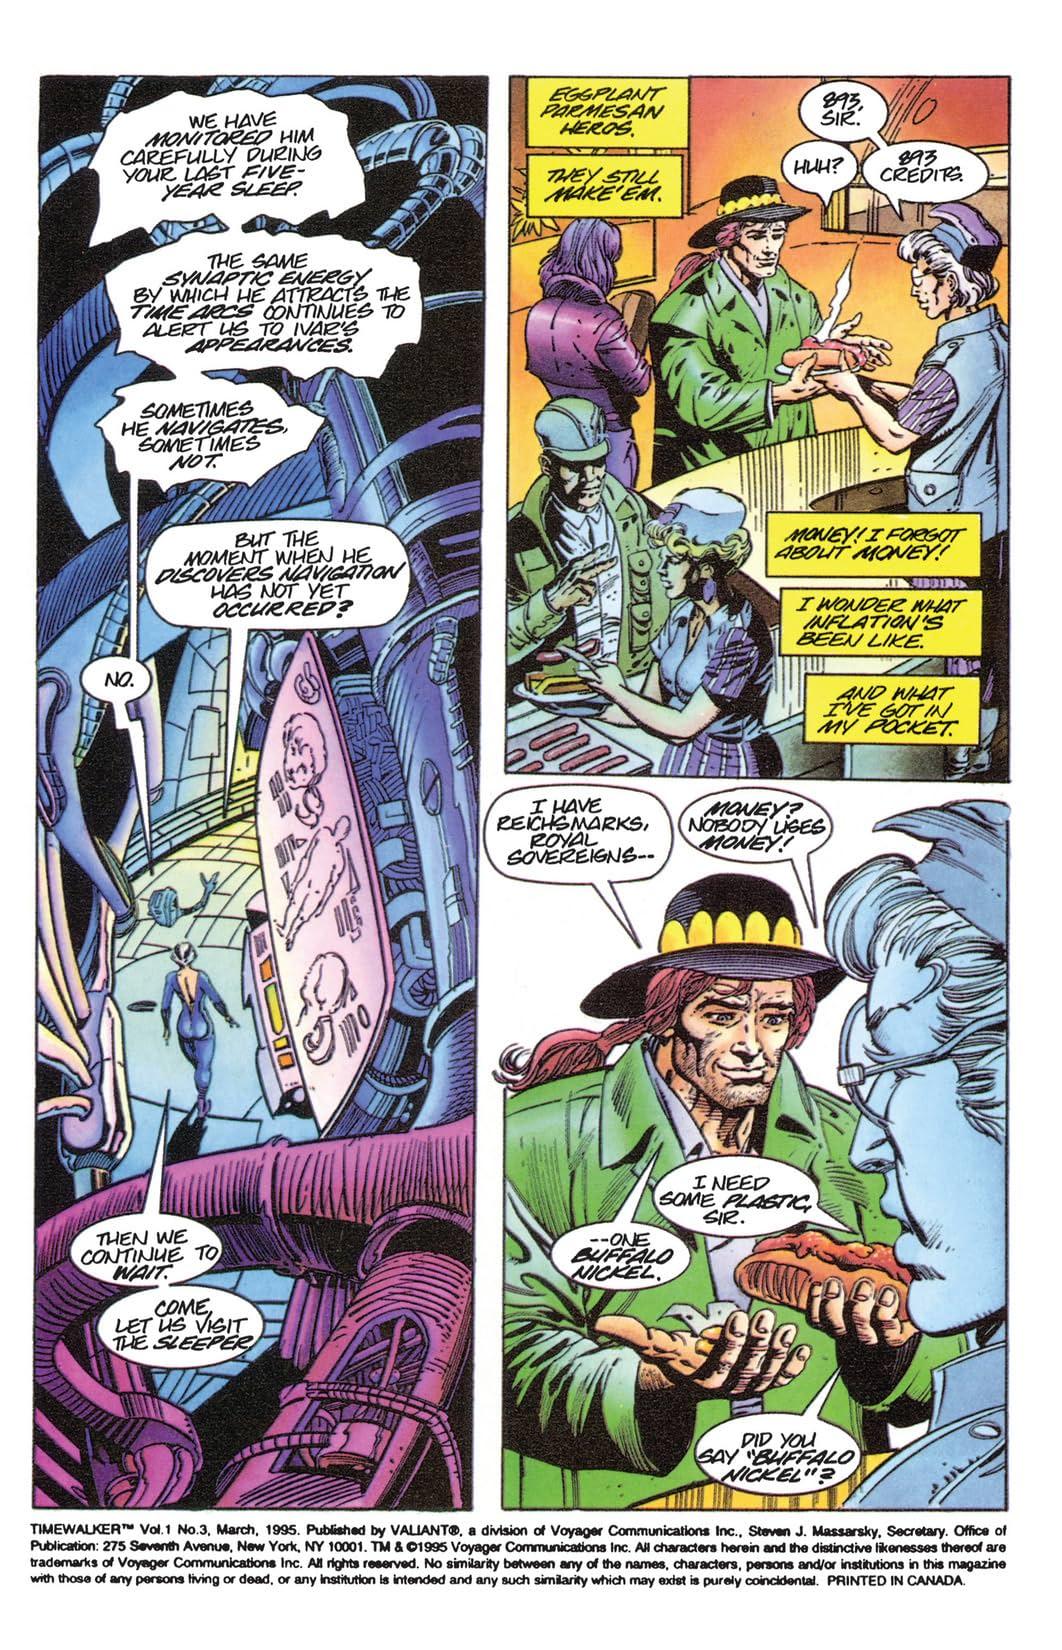 Timewalker (1994) #3